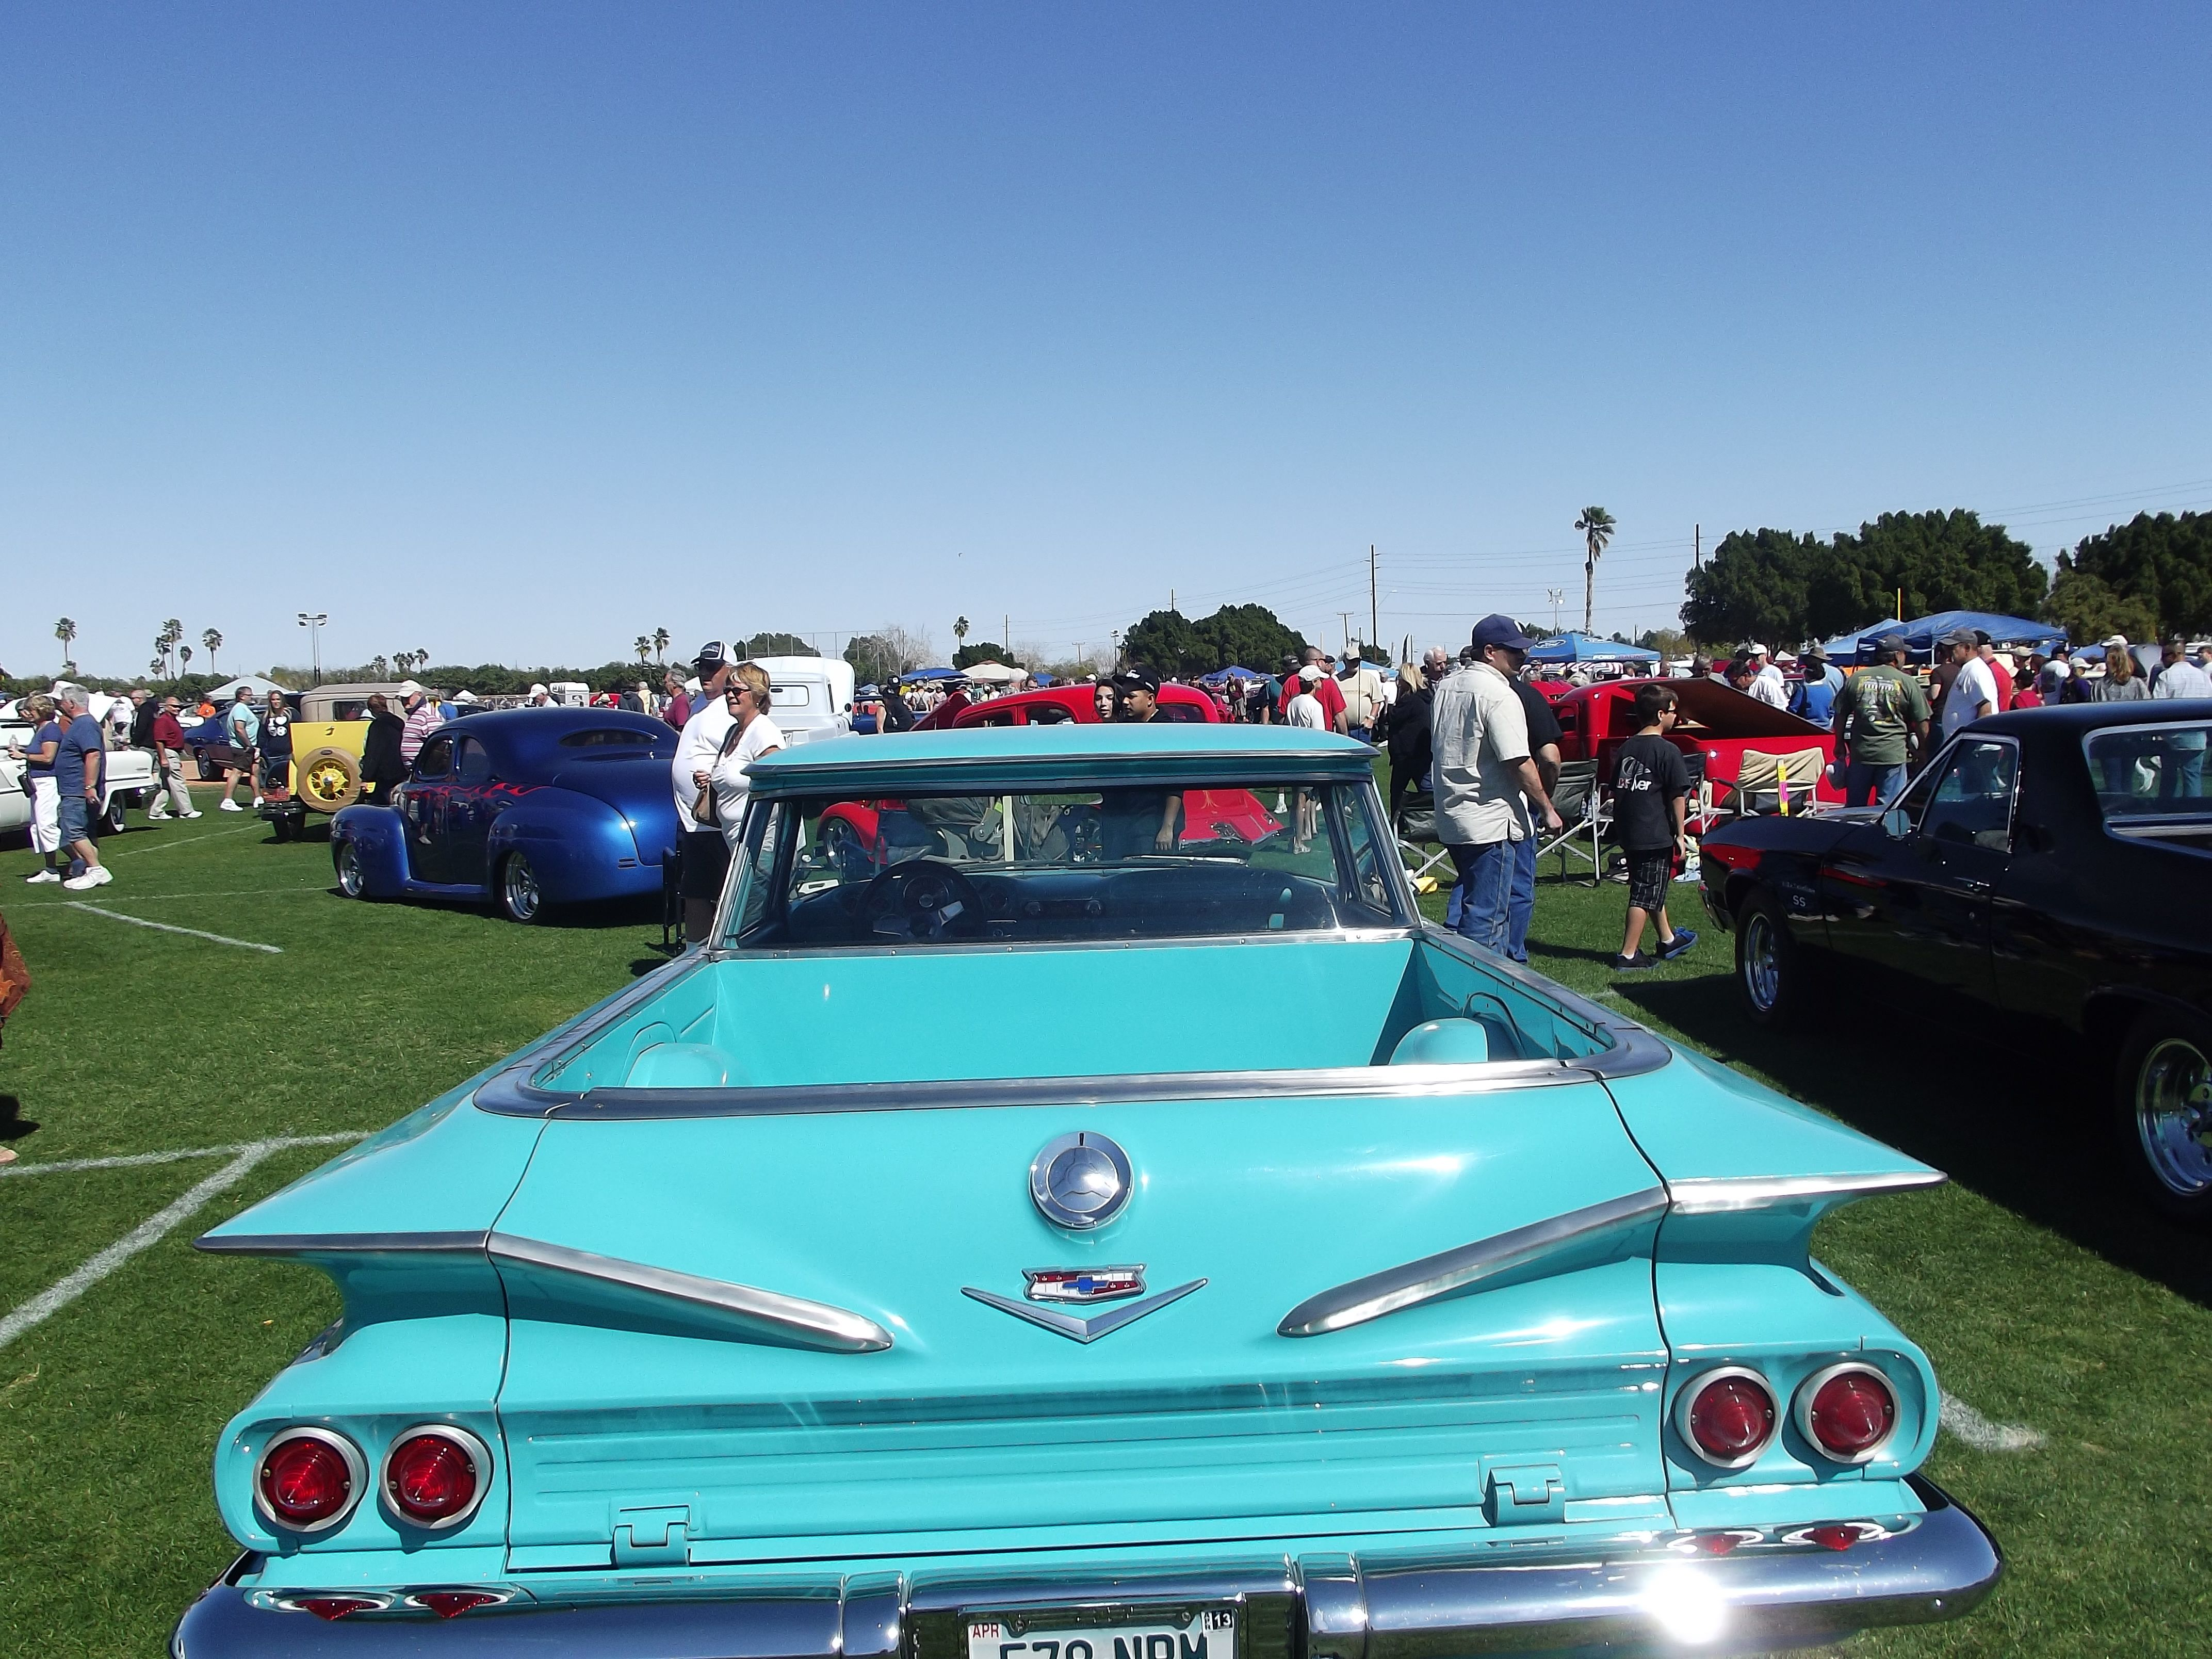 60 Chevy El Camino Midnight The Oasis Yuma Az Blue Car Classic Cars Chevy El Camino